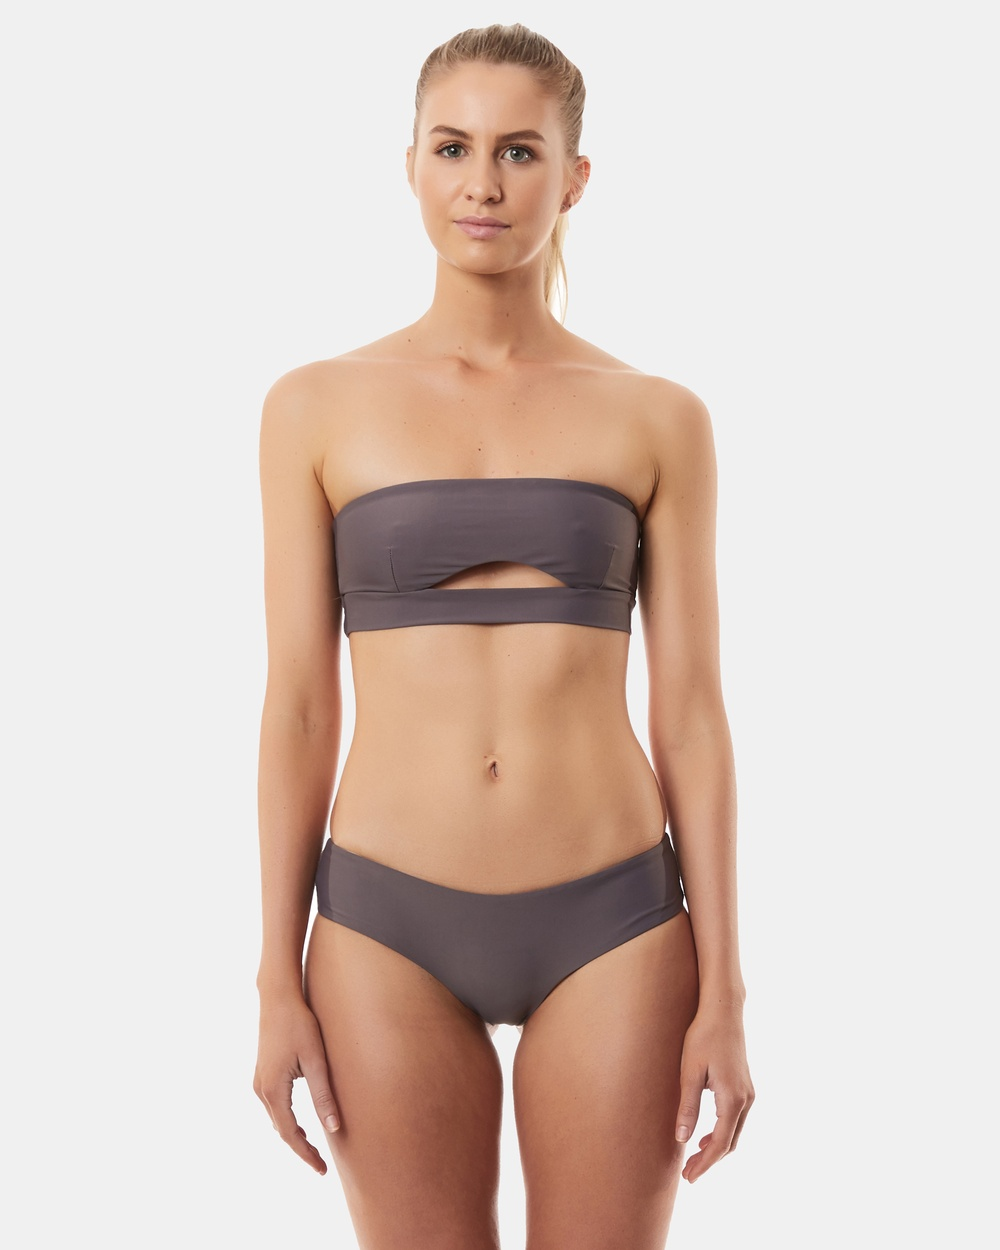 Seapia Monte Bikini Bottoms Bikini Bottoms Neutral Monte Bikini Bottoms